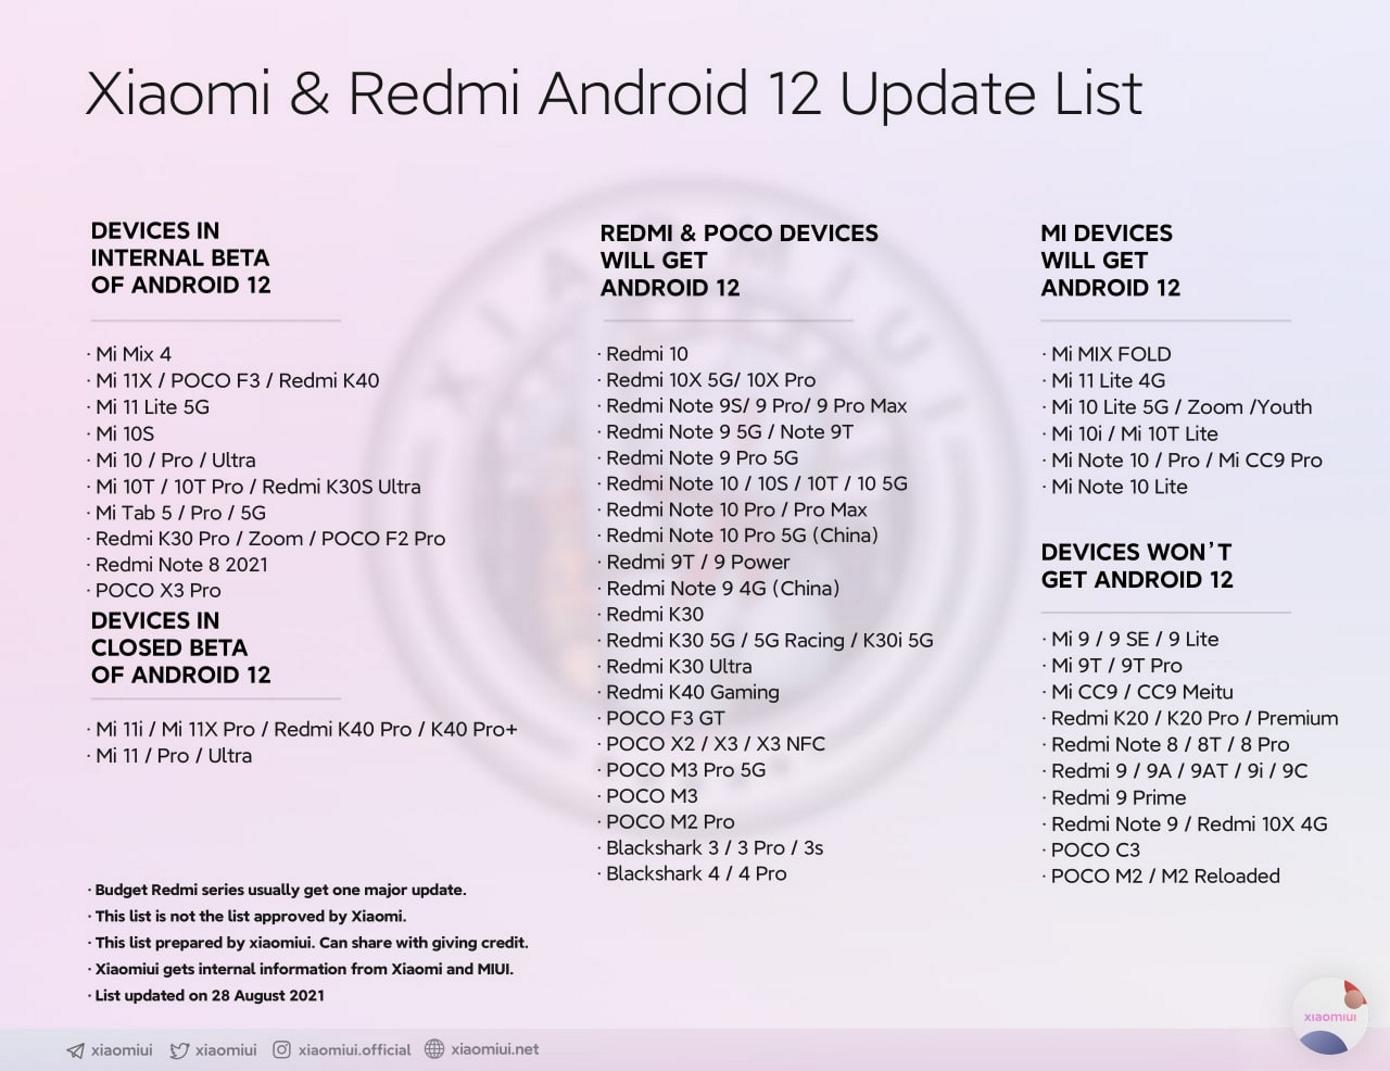 Novosti Ob Android 12 Funkczionale Mi 11t I Ocherednom Smeshhenii Apple S Liderstva 7